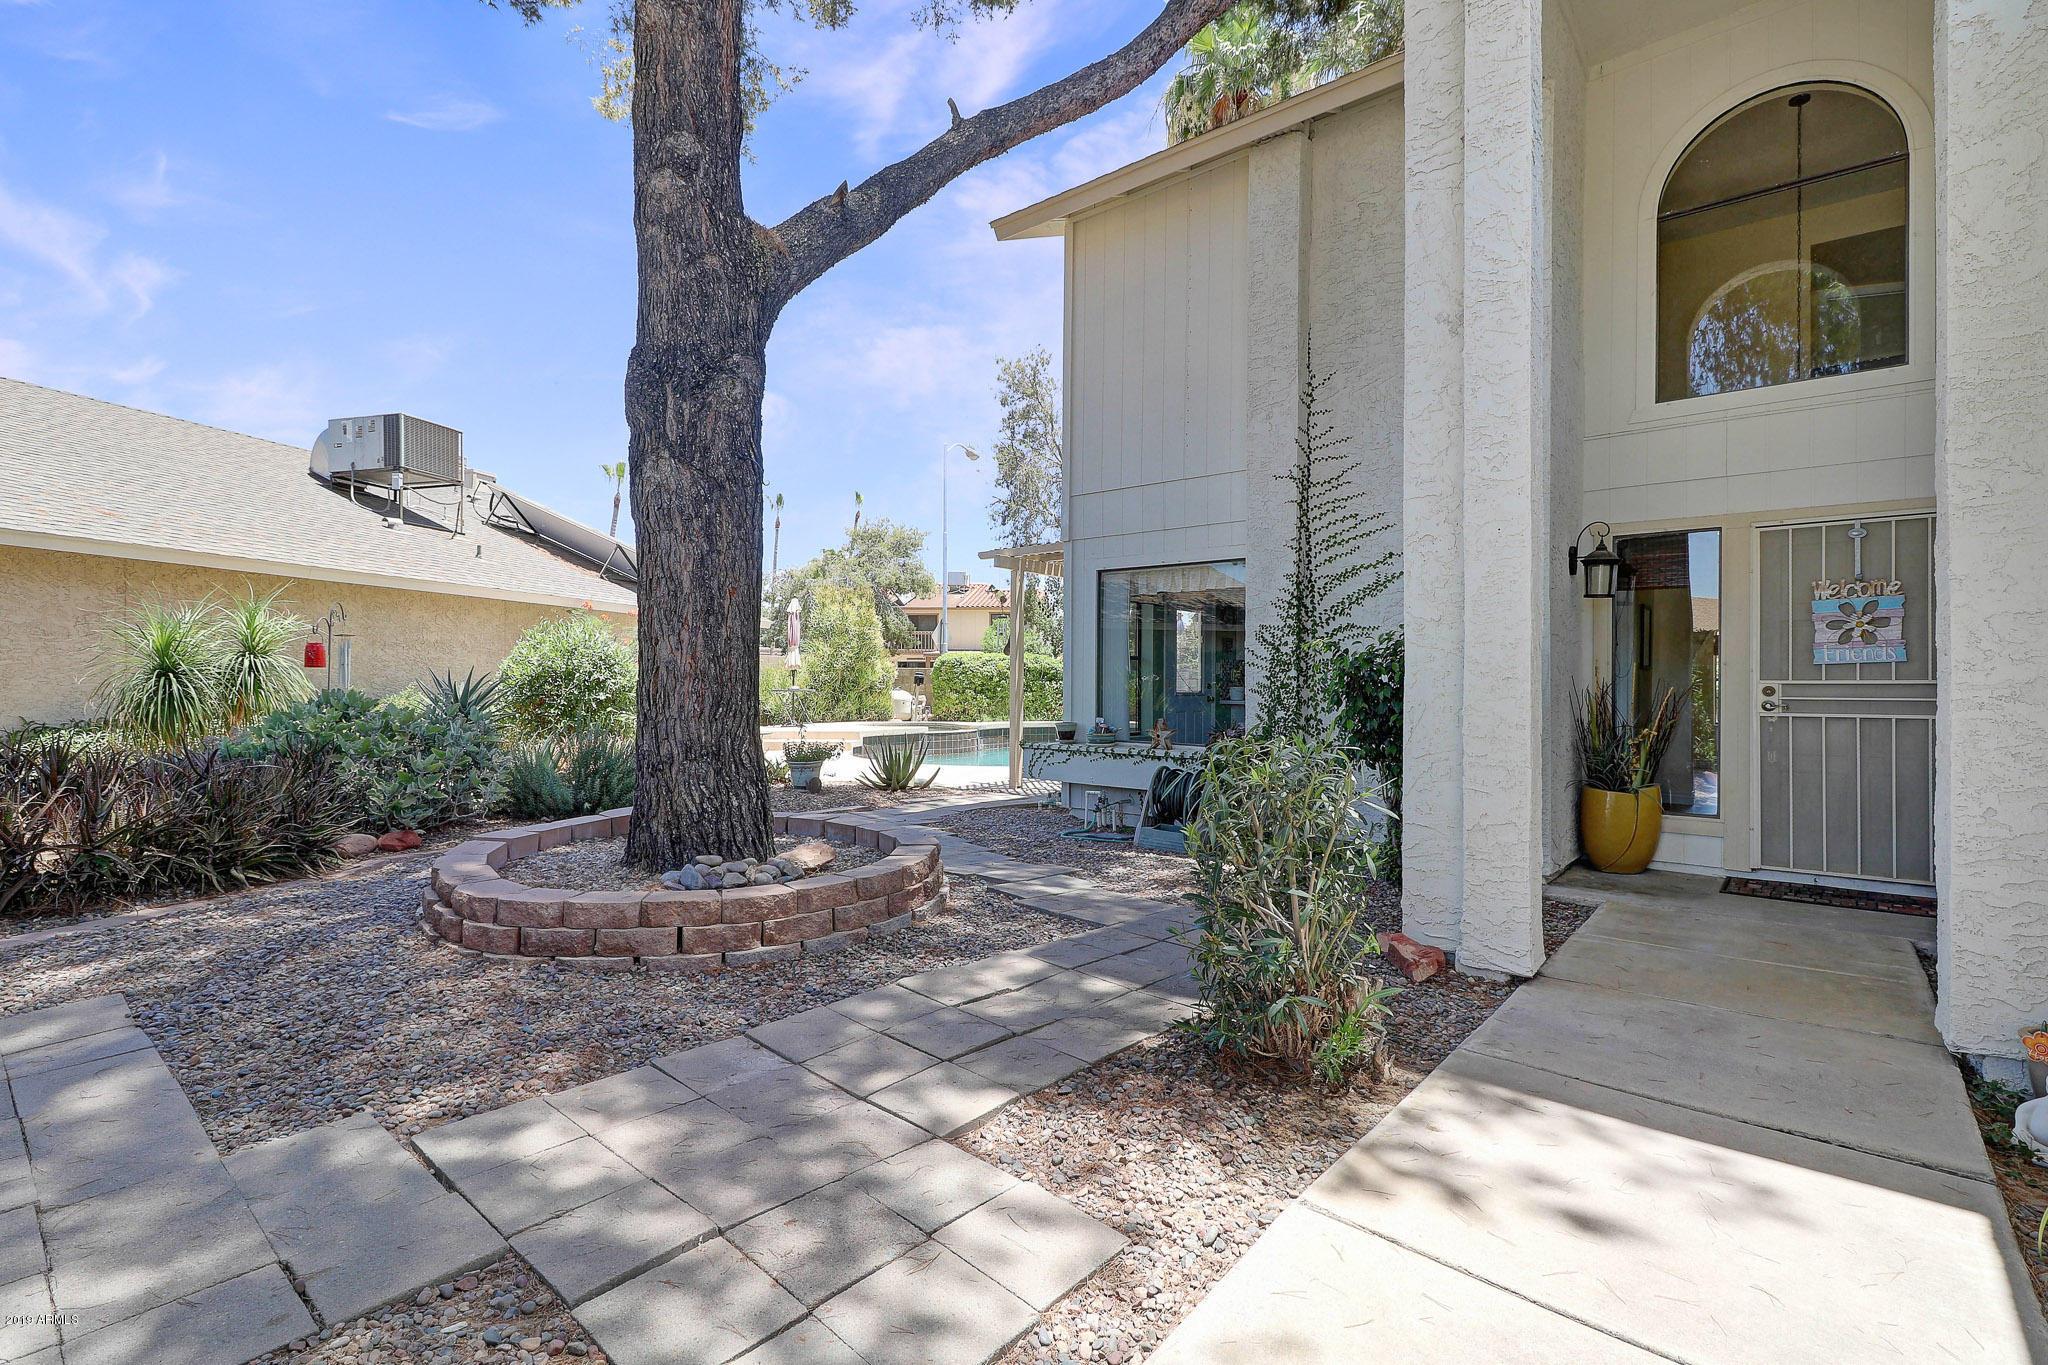 MLS 5941535 2231 S LAS PALMAS Circle, Mesa, AZ 85202 Mesa AZ Dobson Ranch